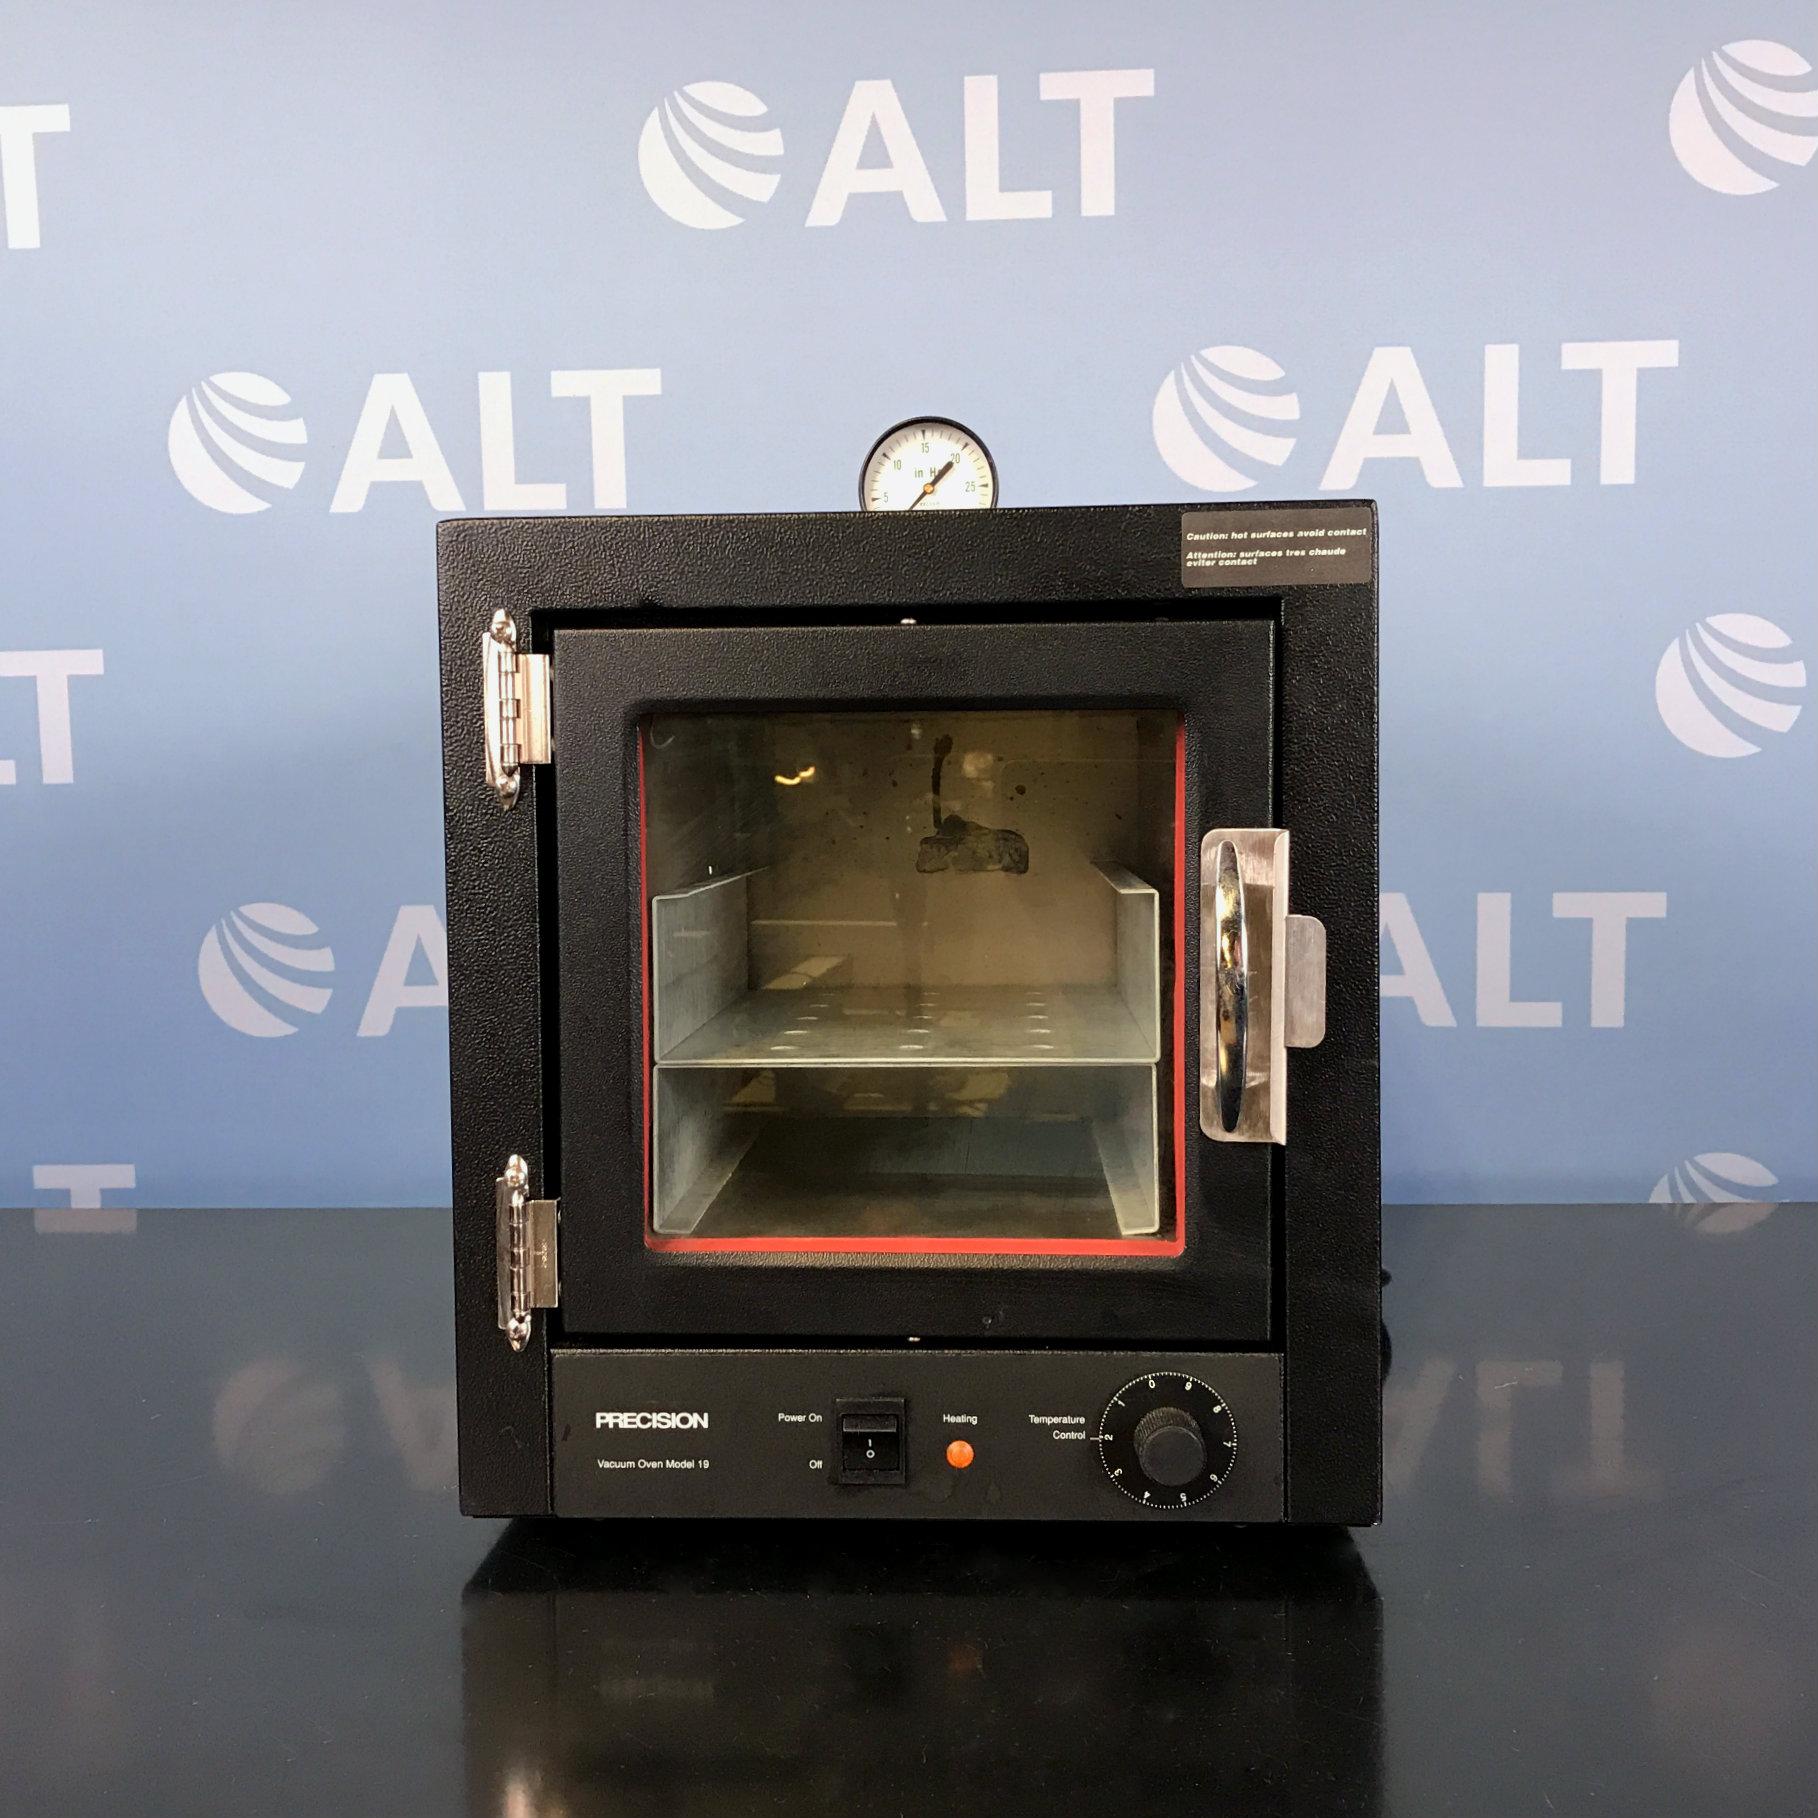 Precision Model 119 Vacuum Oven Image